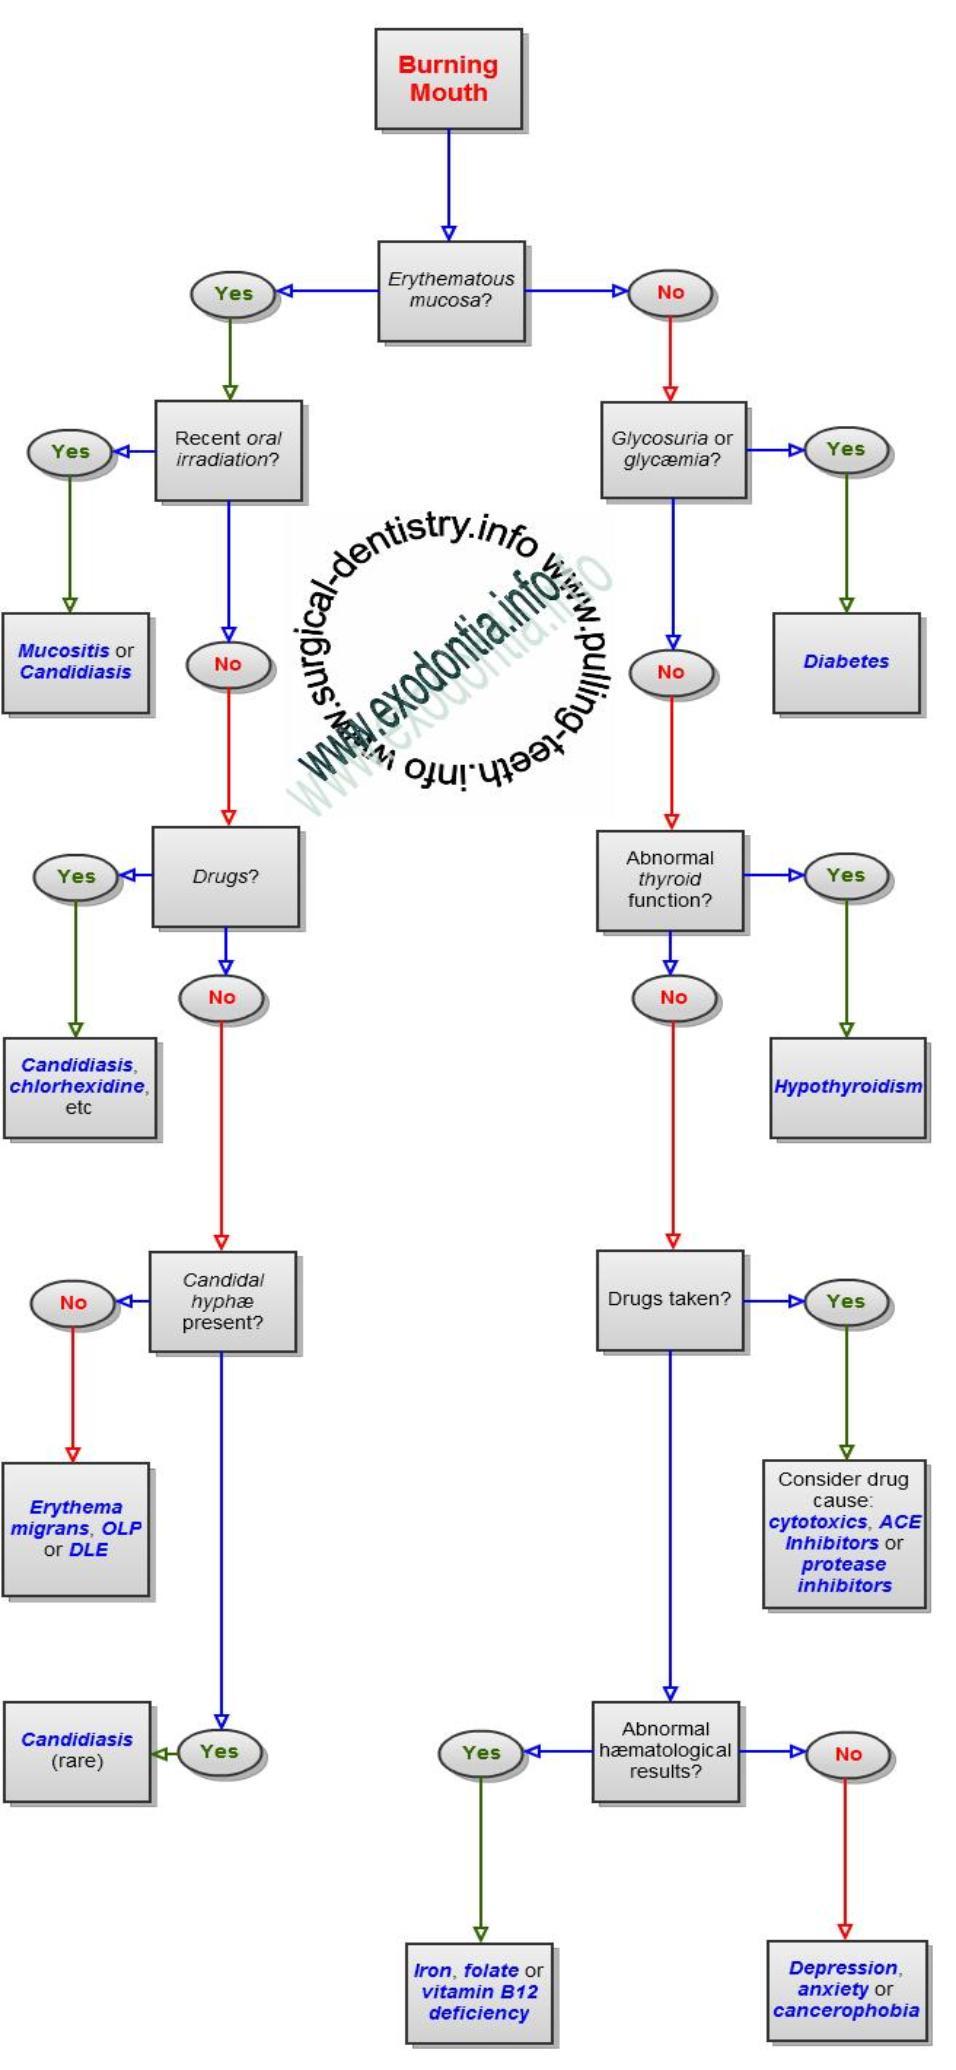 Burning Mouth Syndrome - Diagnosis Algorithm